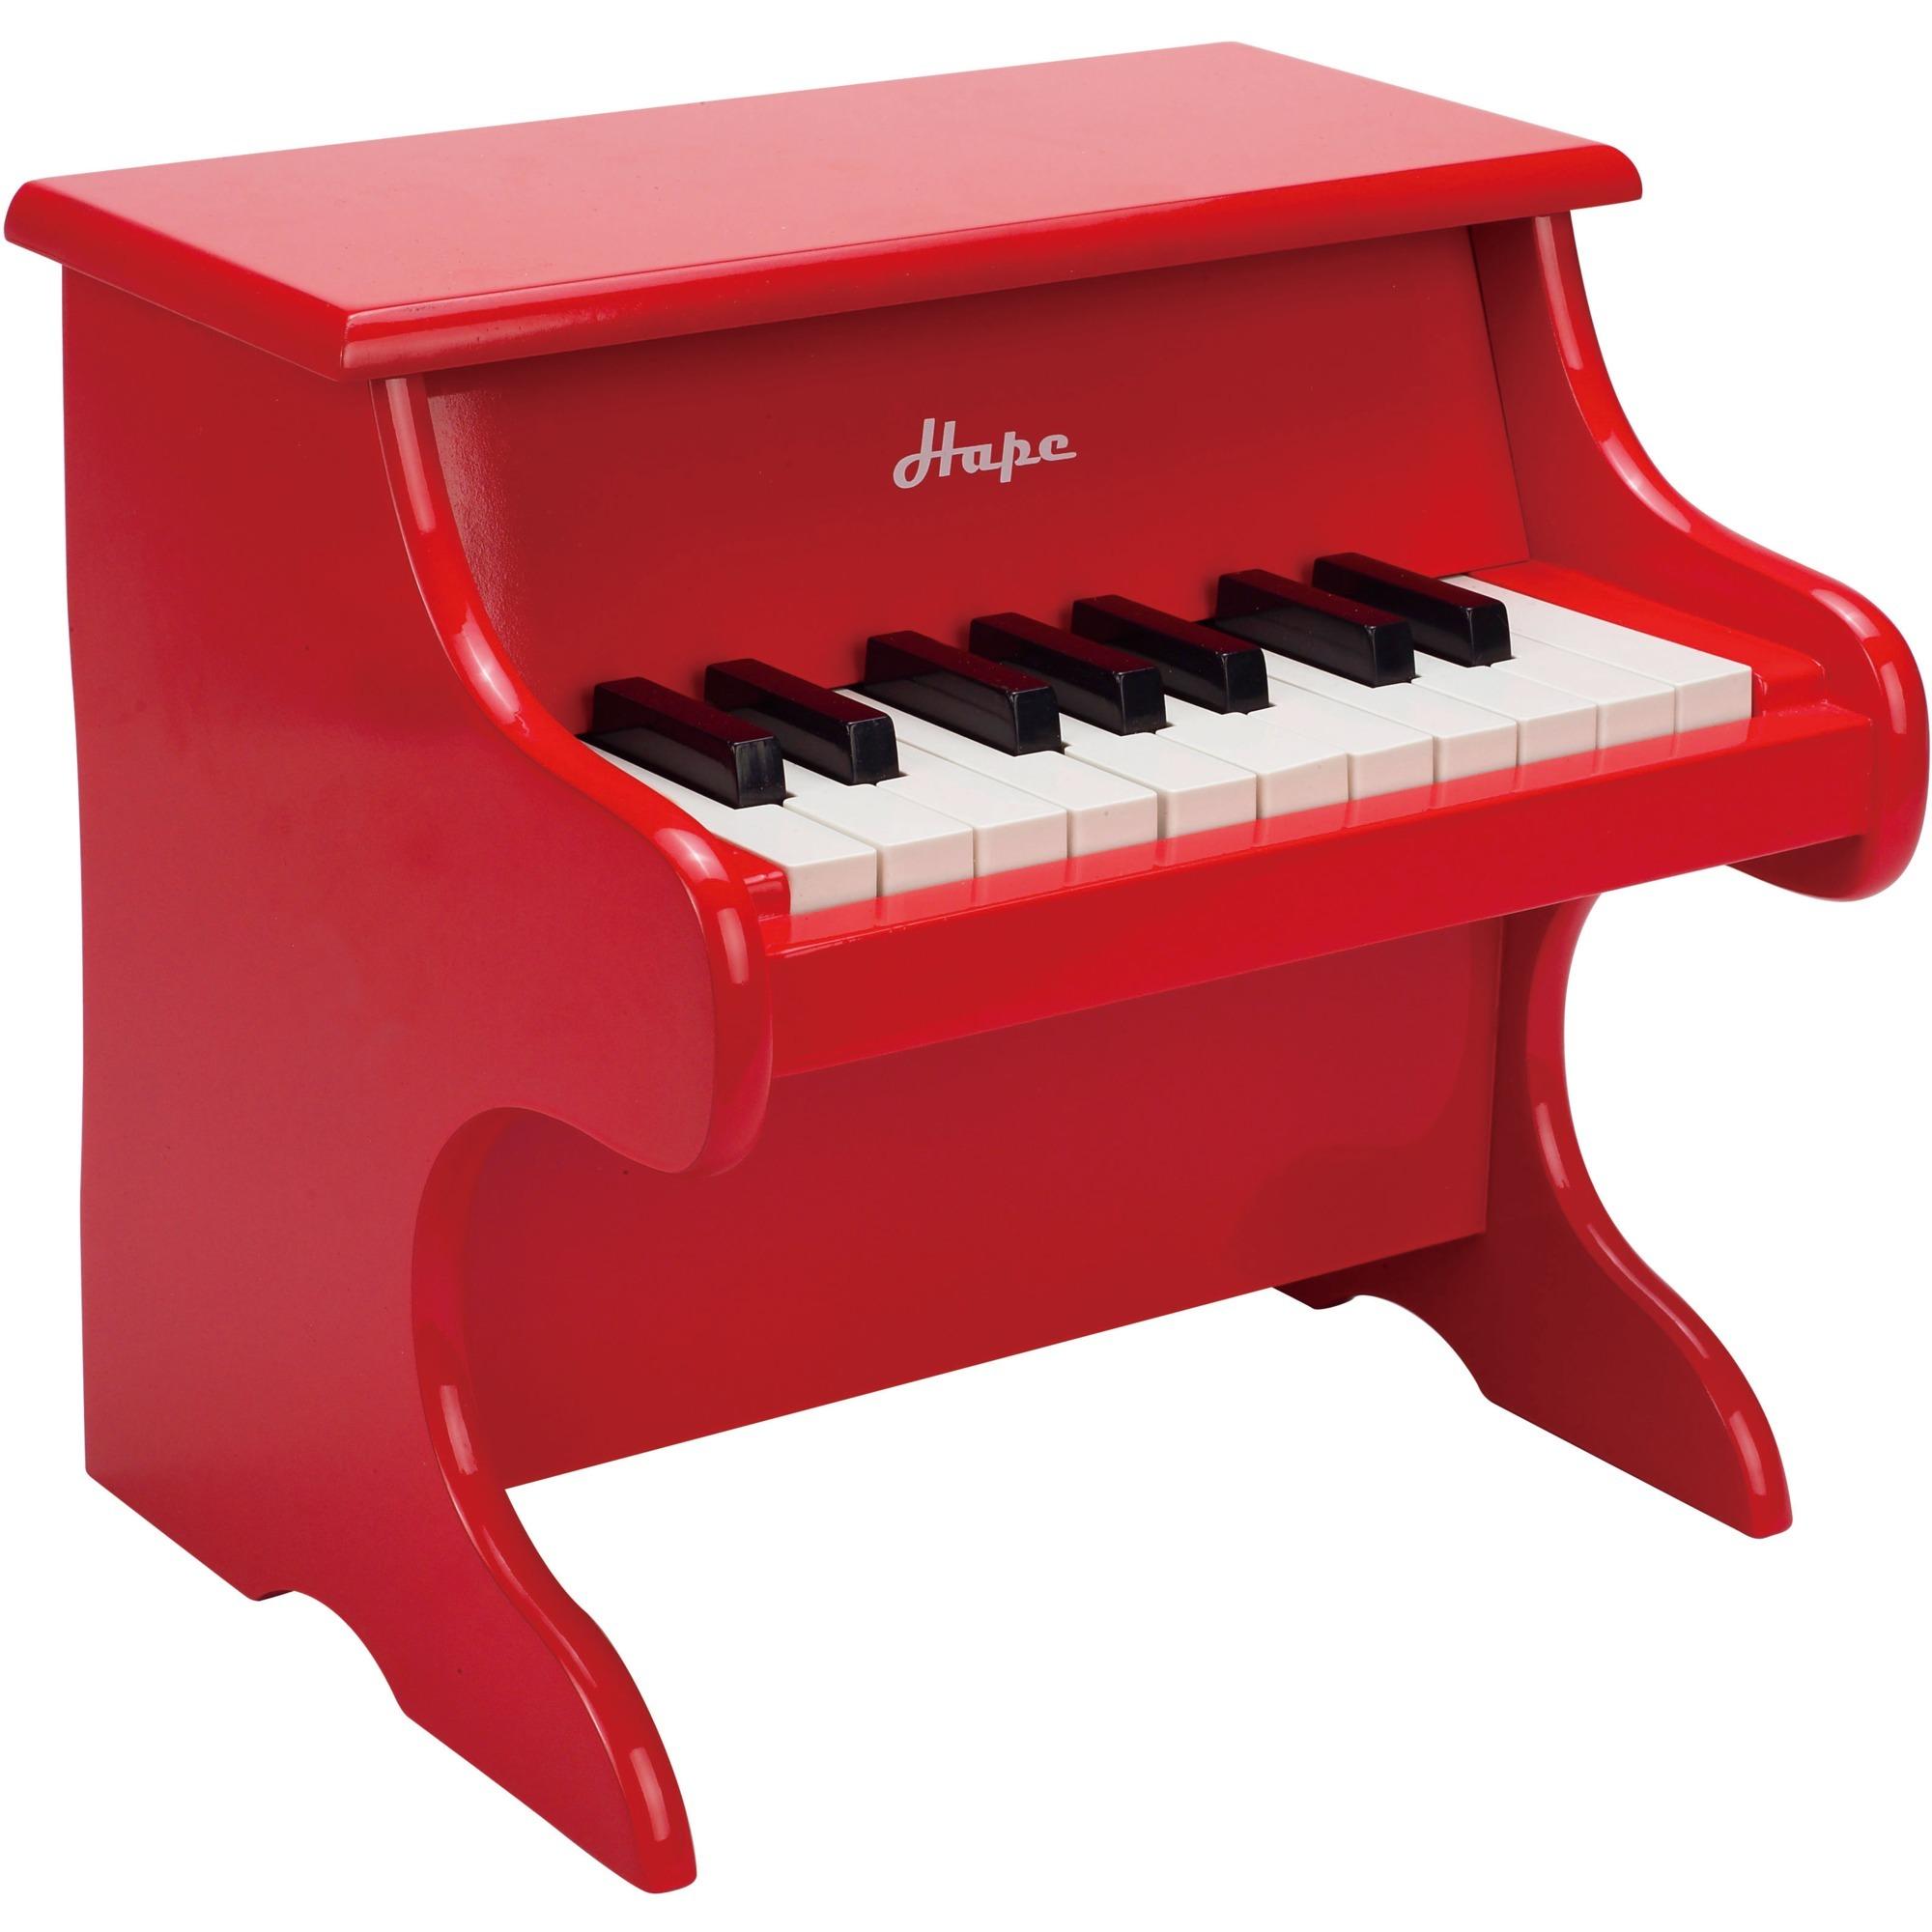 E0318 juguete musical, Instrumentos musicales